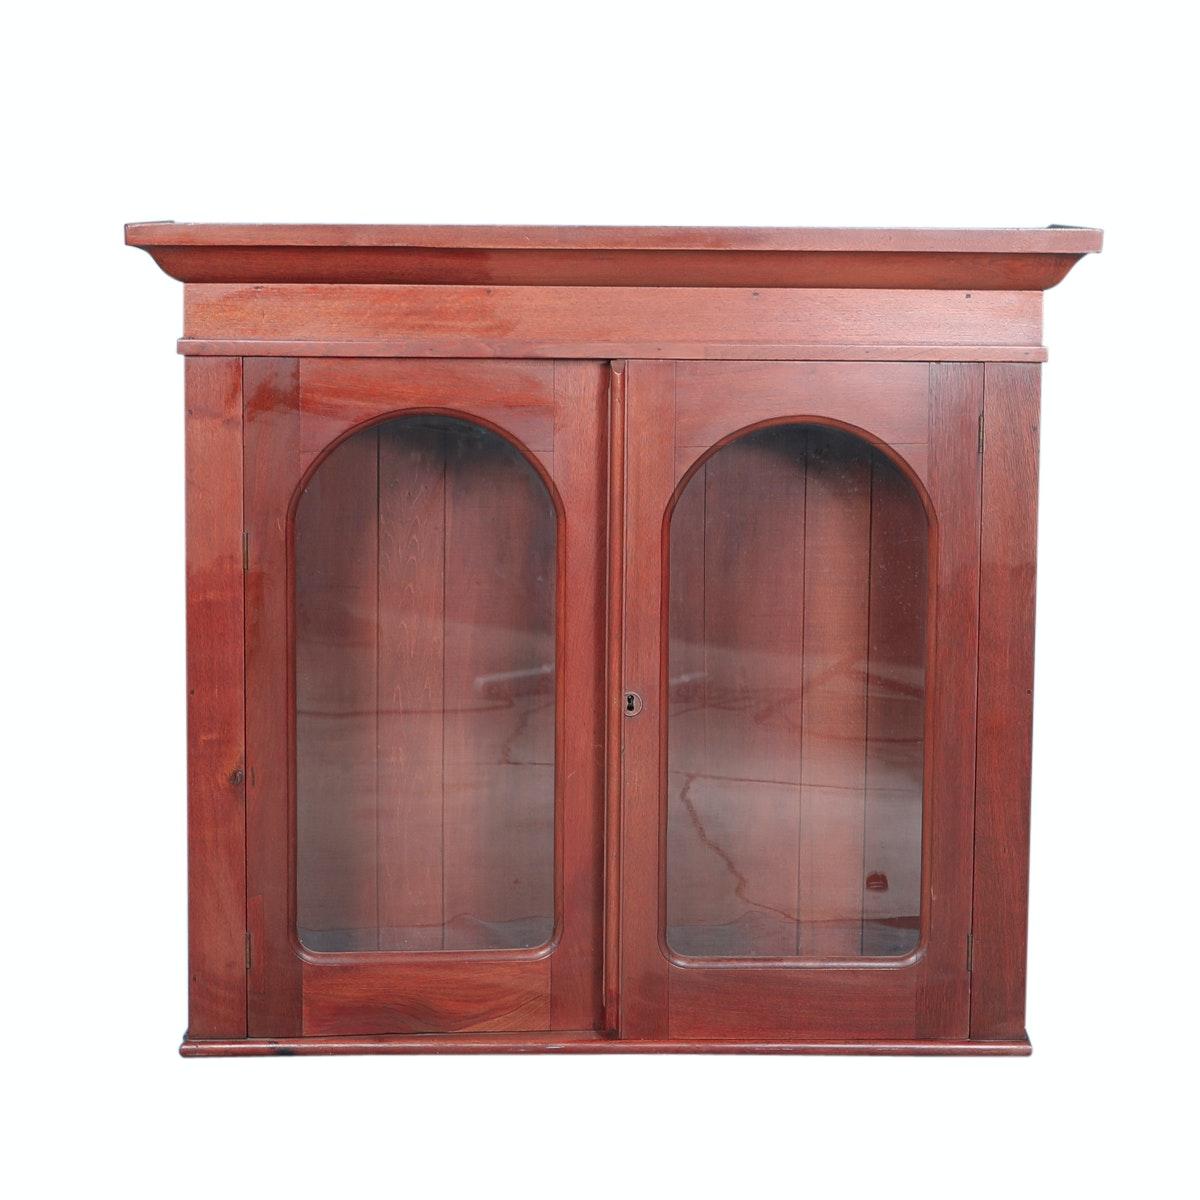 Antique Mahogany Hanging Cabinet